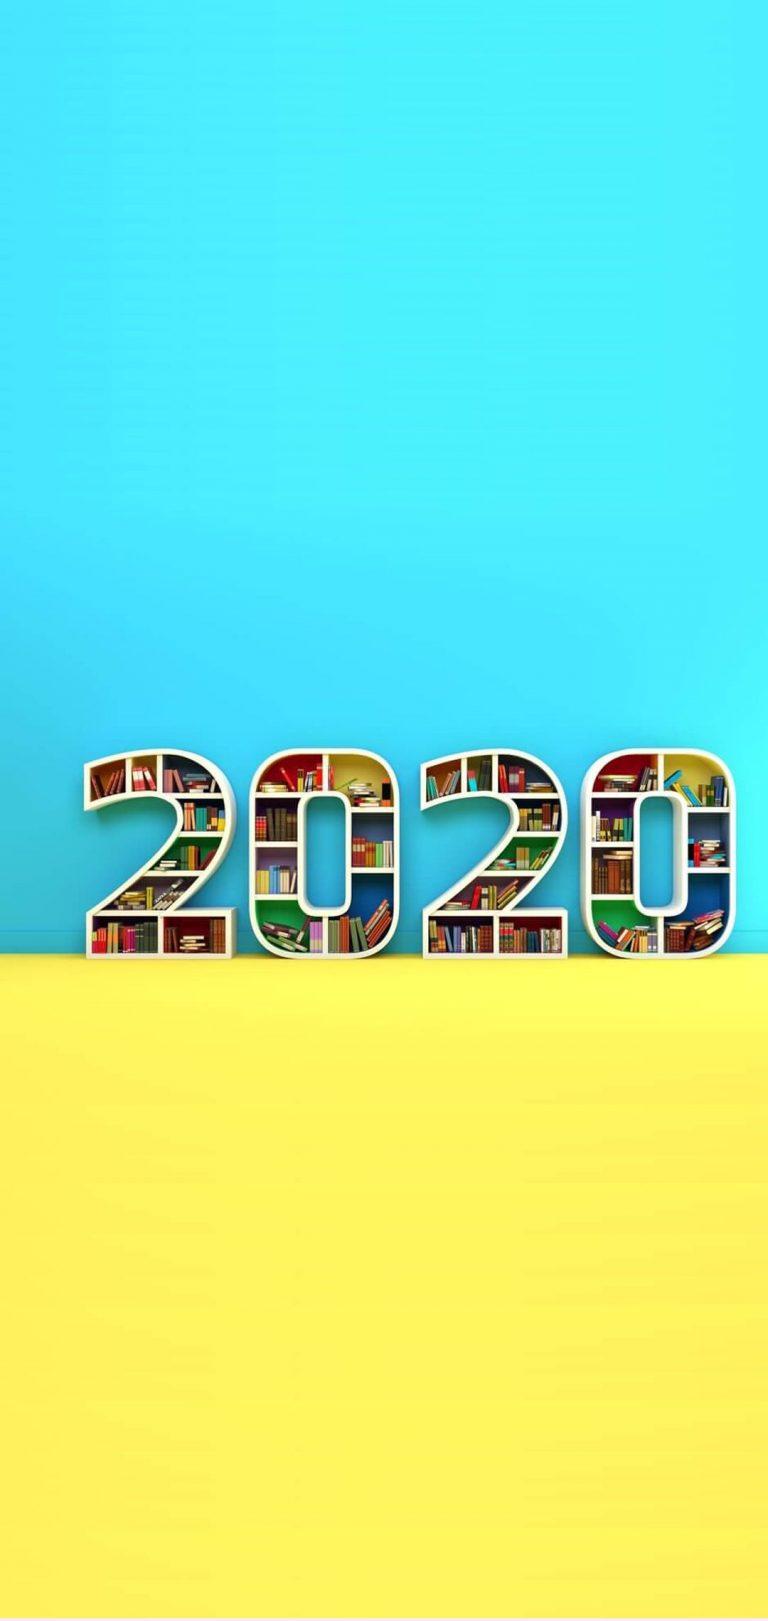 Happy New Year 2020 Phone Wallpaper 27 - [1080x2280]